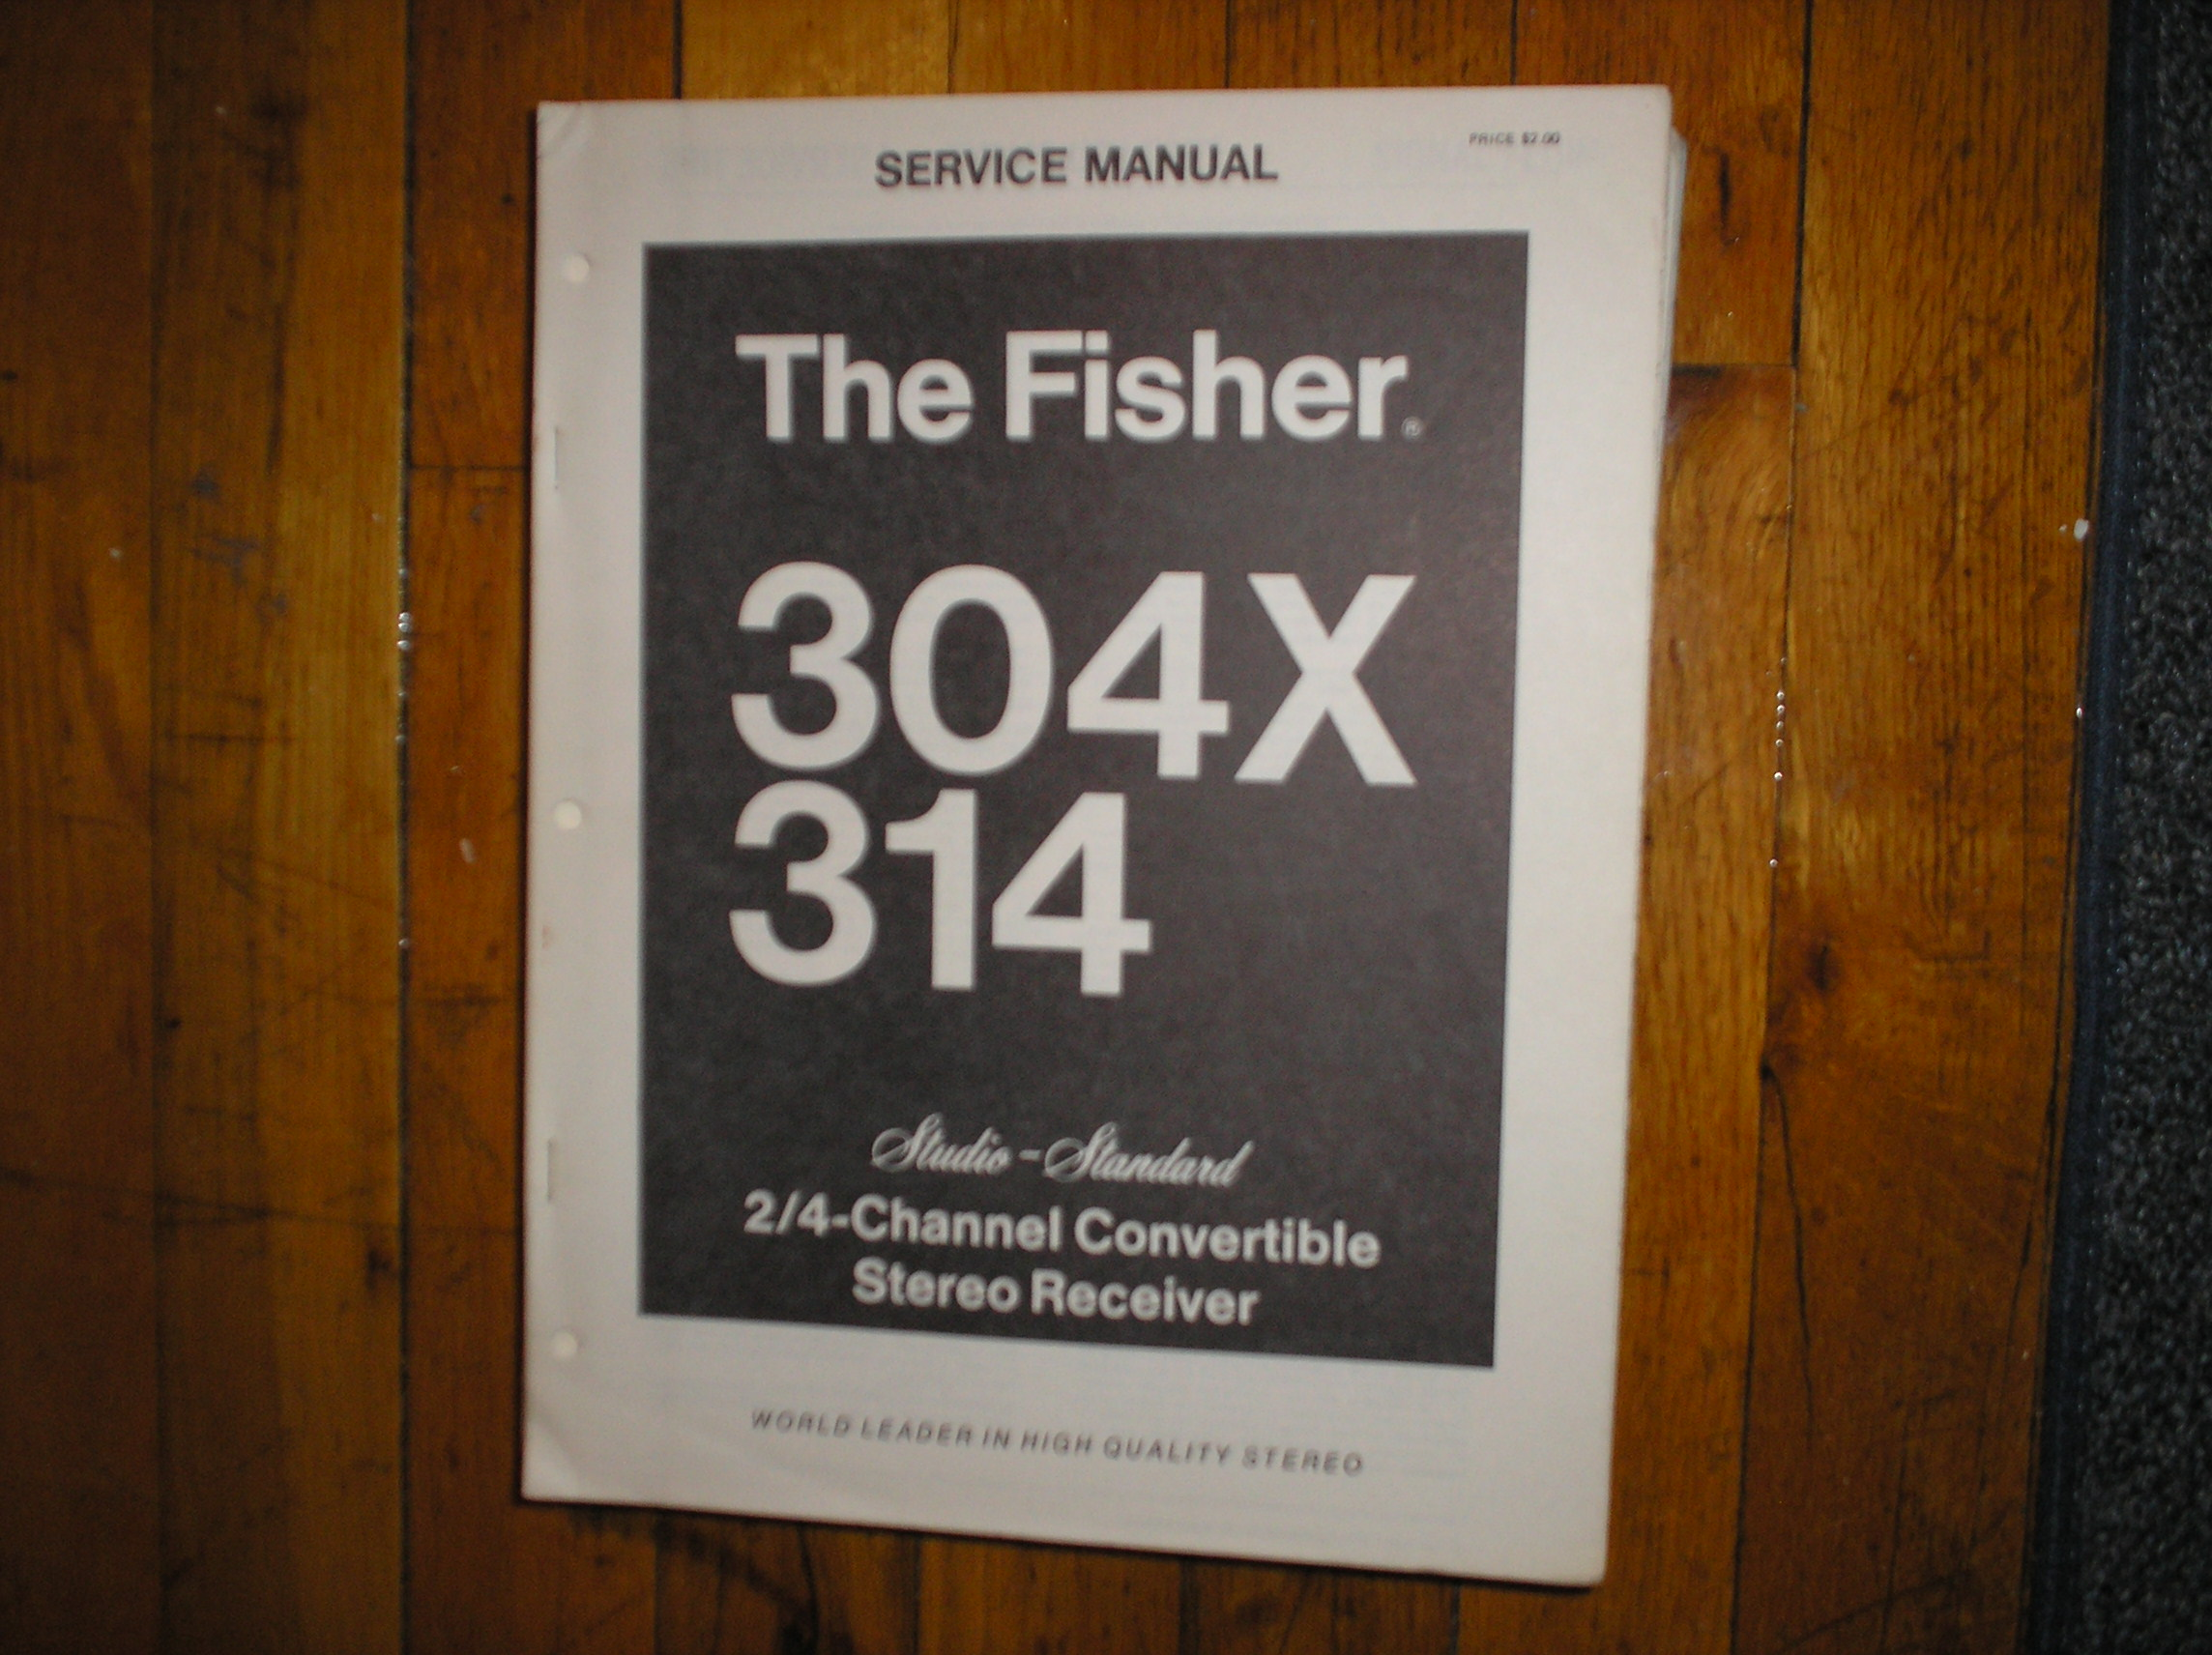 304X 314 Receiver Service Manual